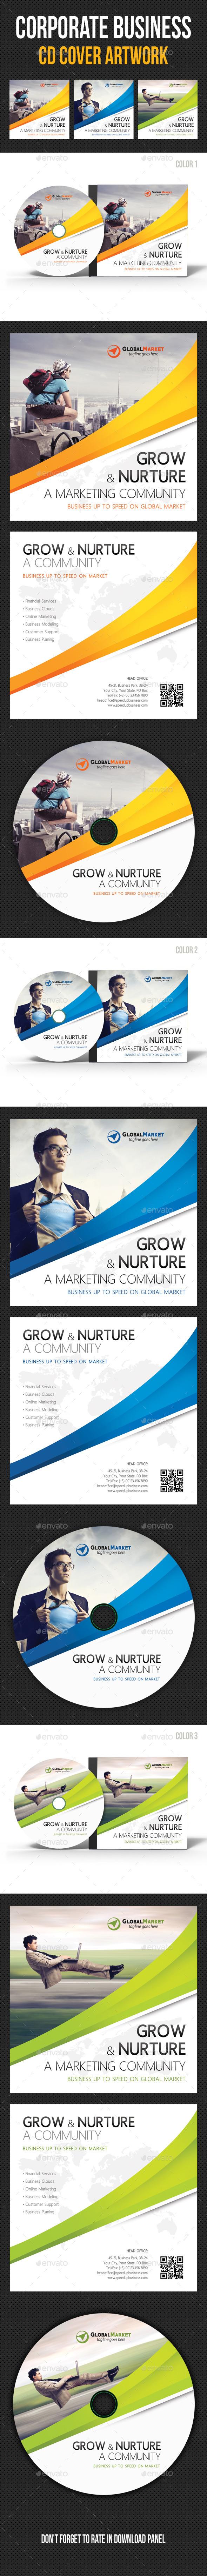 Corporate Business CD Cover Artwork V02 - CD & DVD Artwork Print Templates